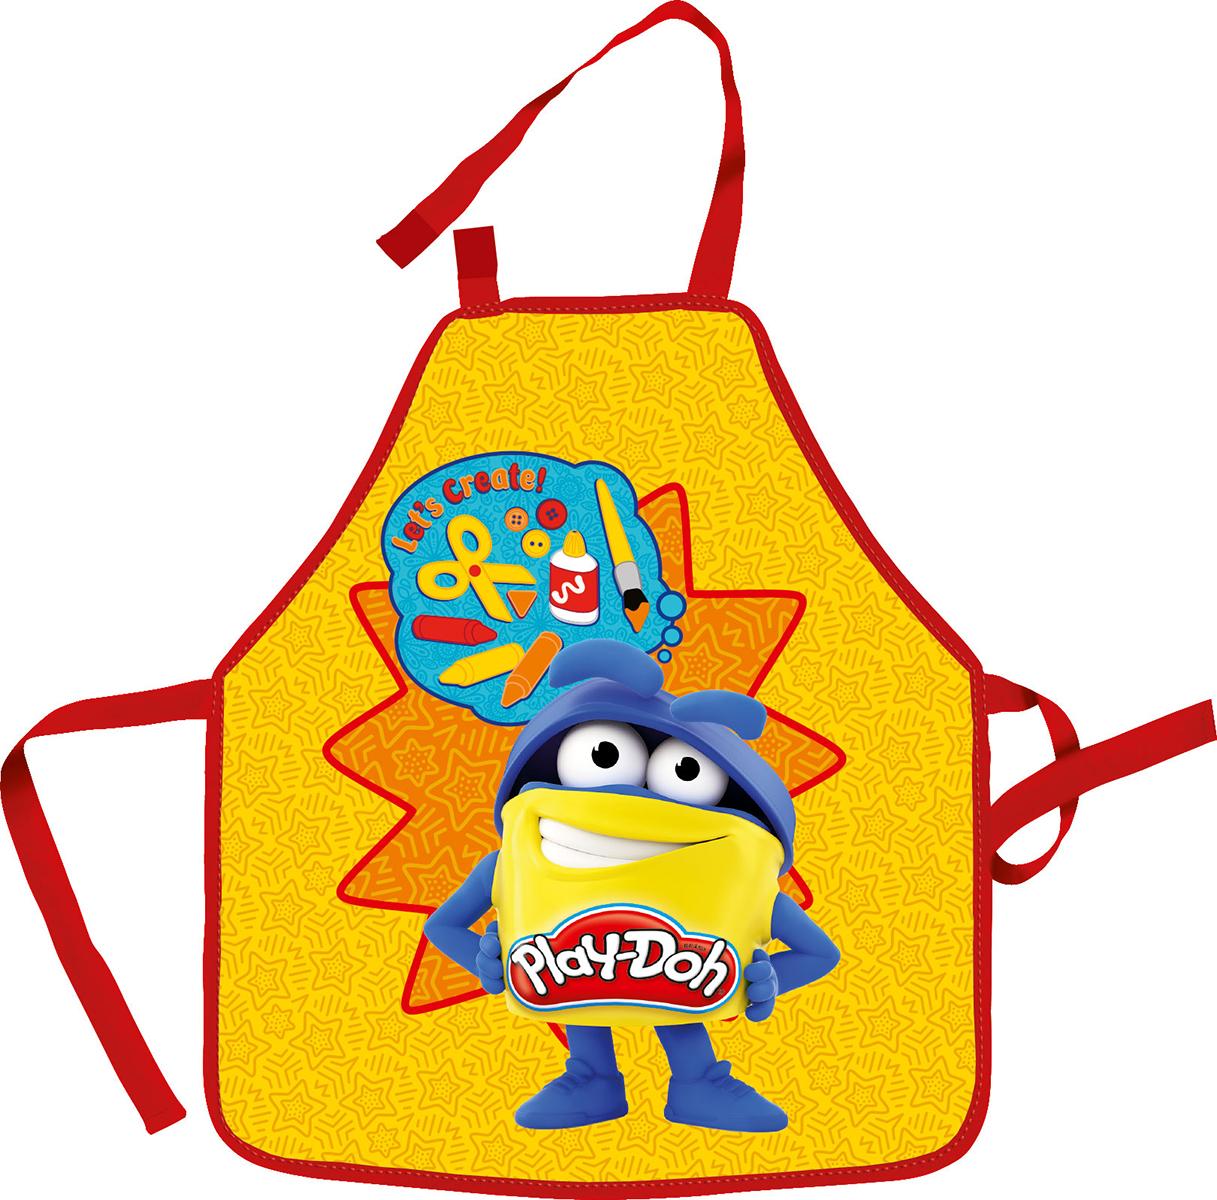 Play-Doh Фартук детский для творческих занятий -  Аксессуары для труда